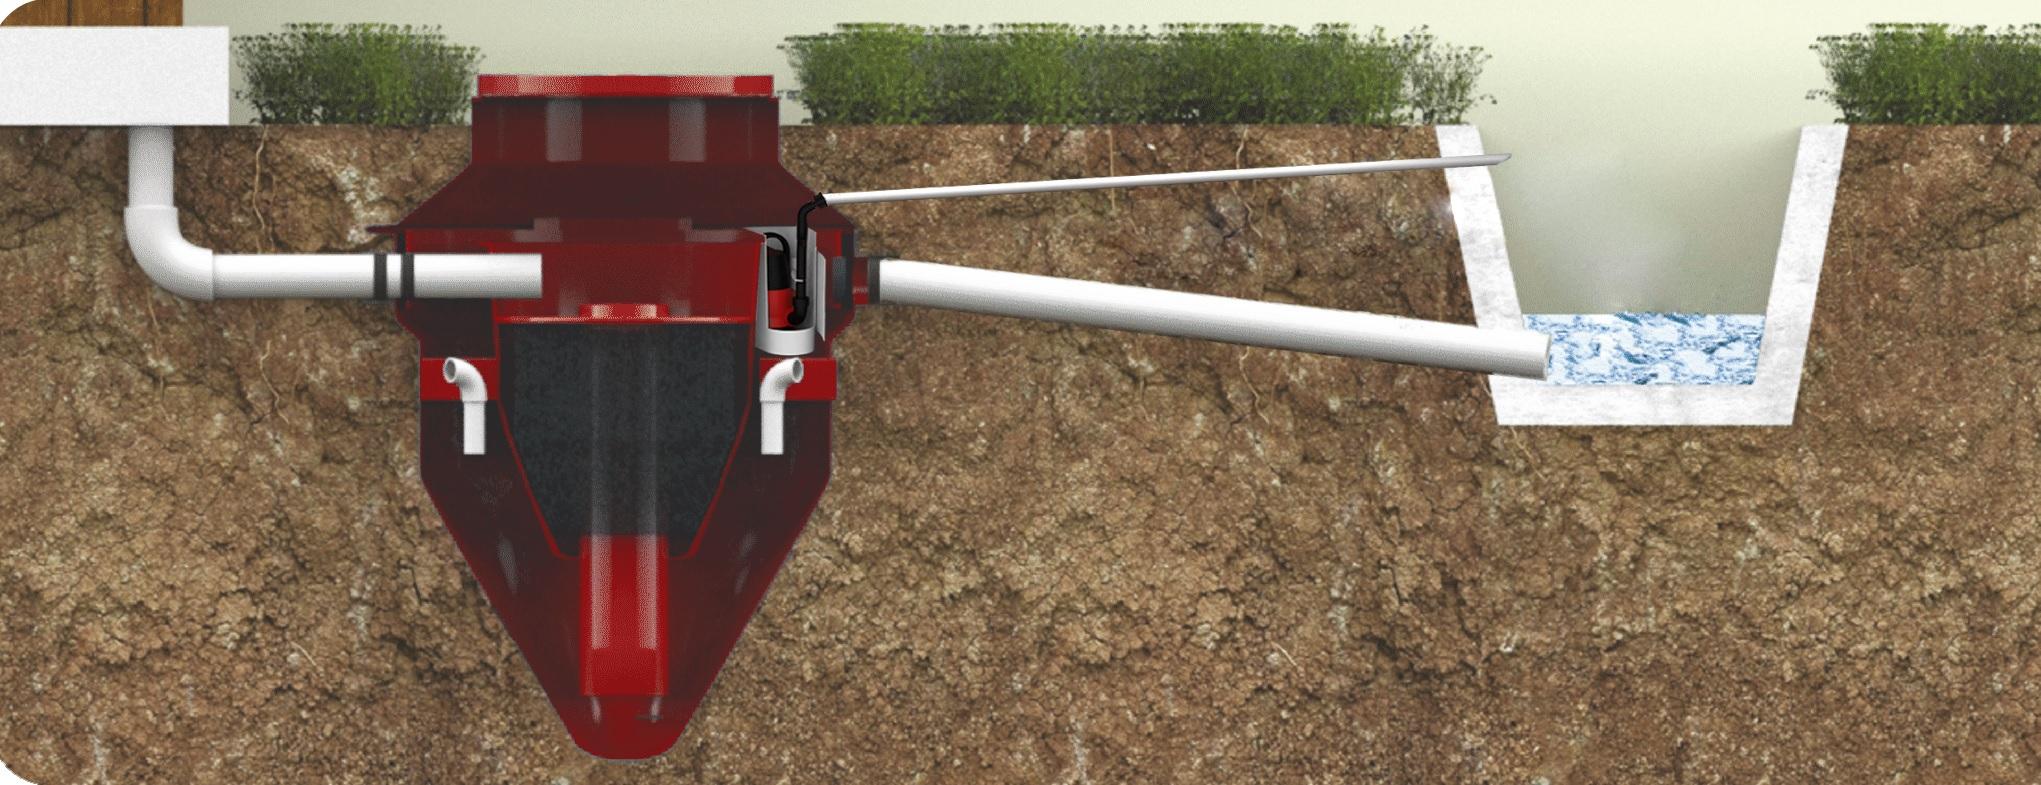 sani avtonomnaya kanalizaciya Производство автономной канализации для дома